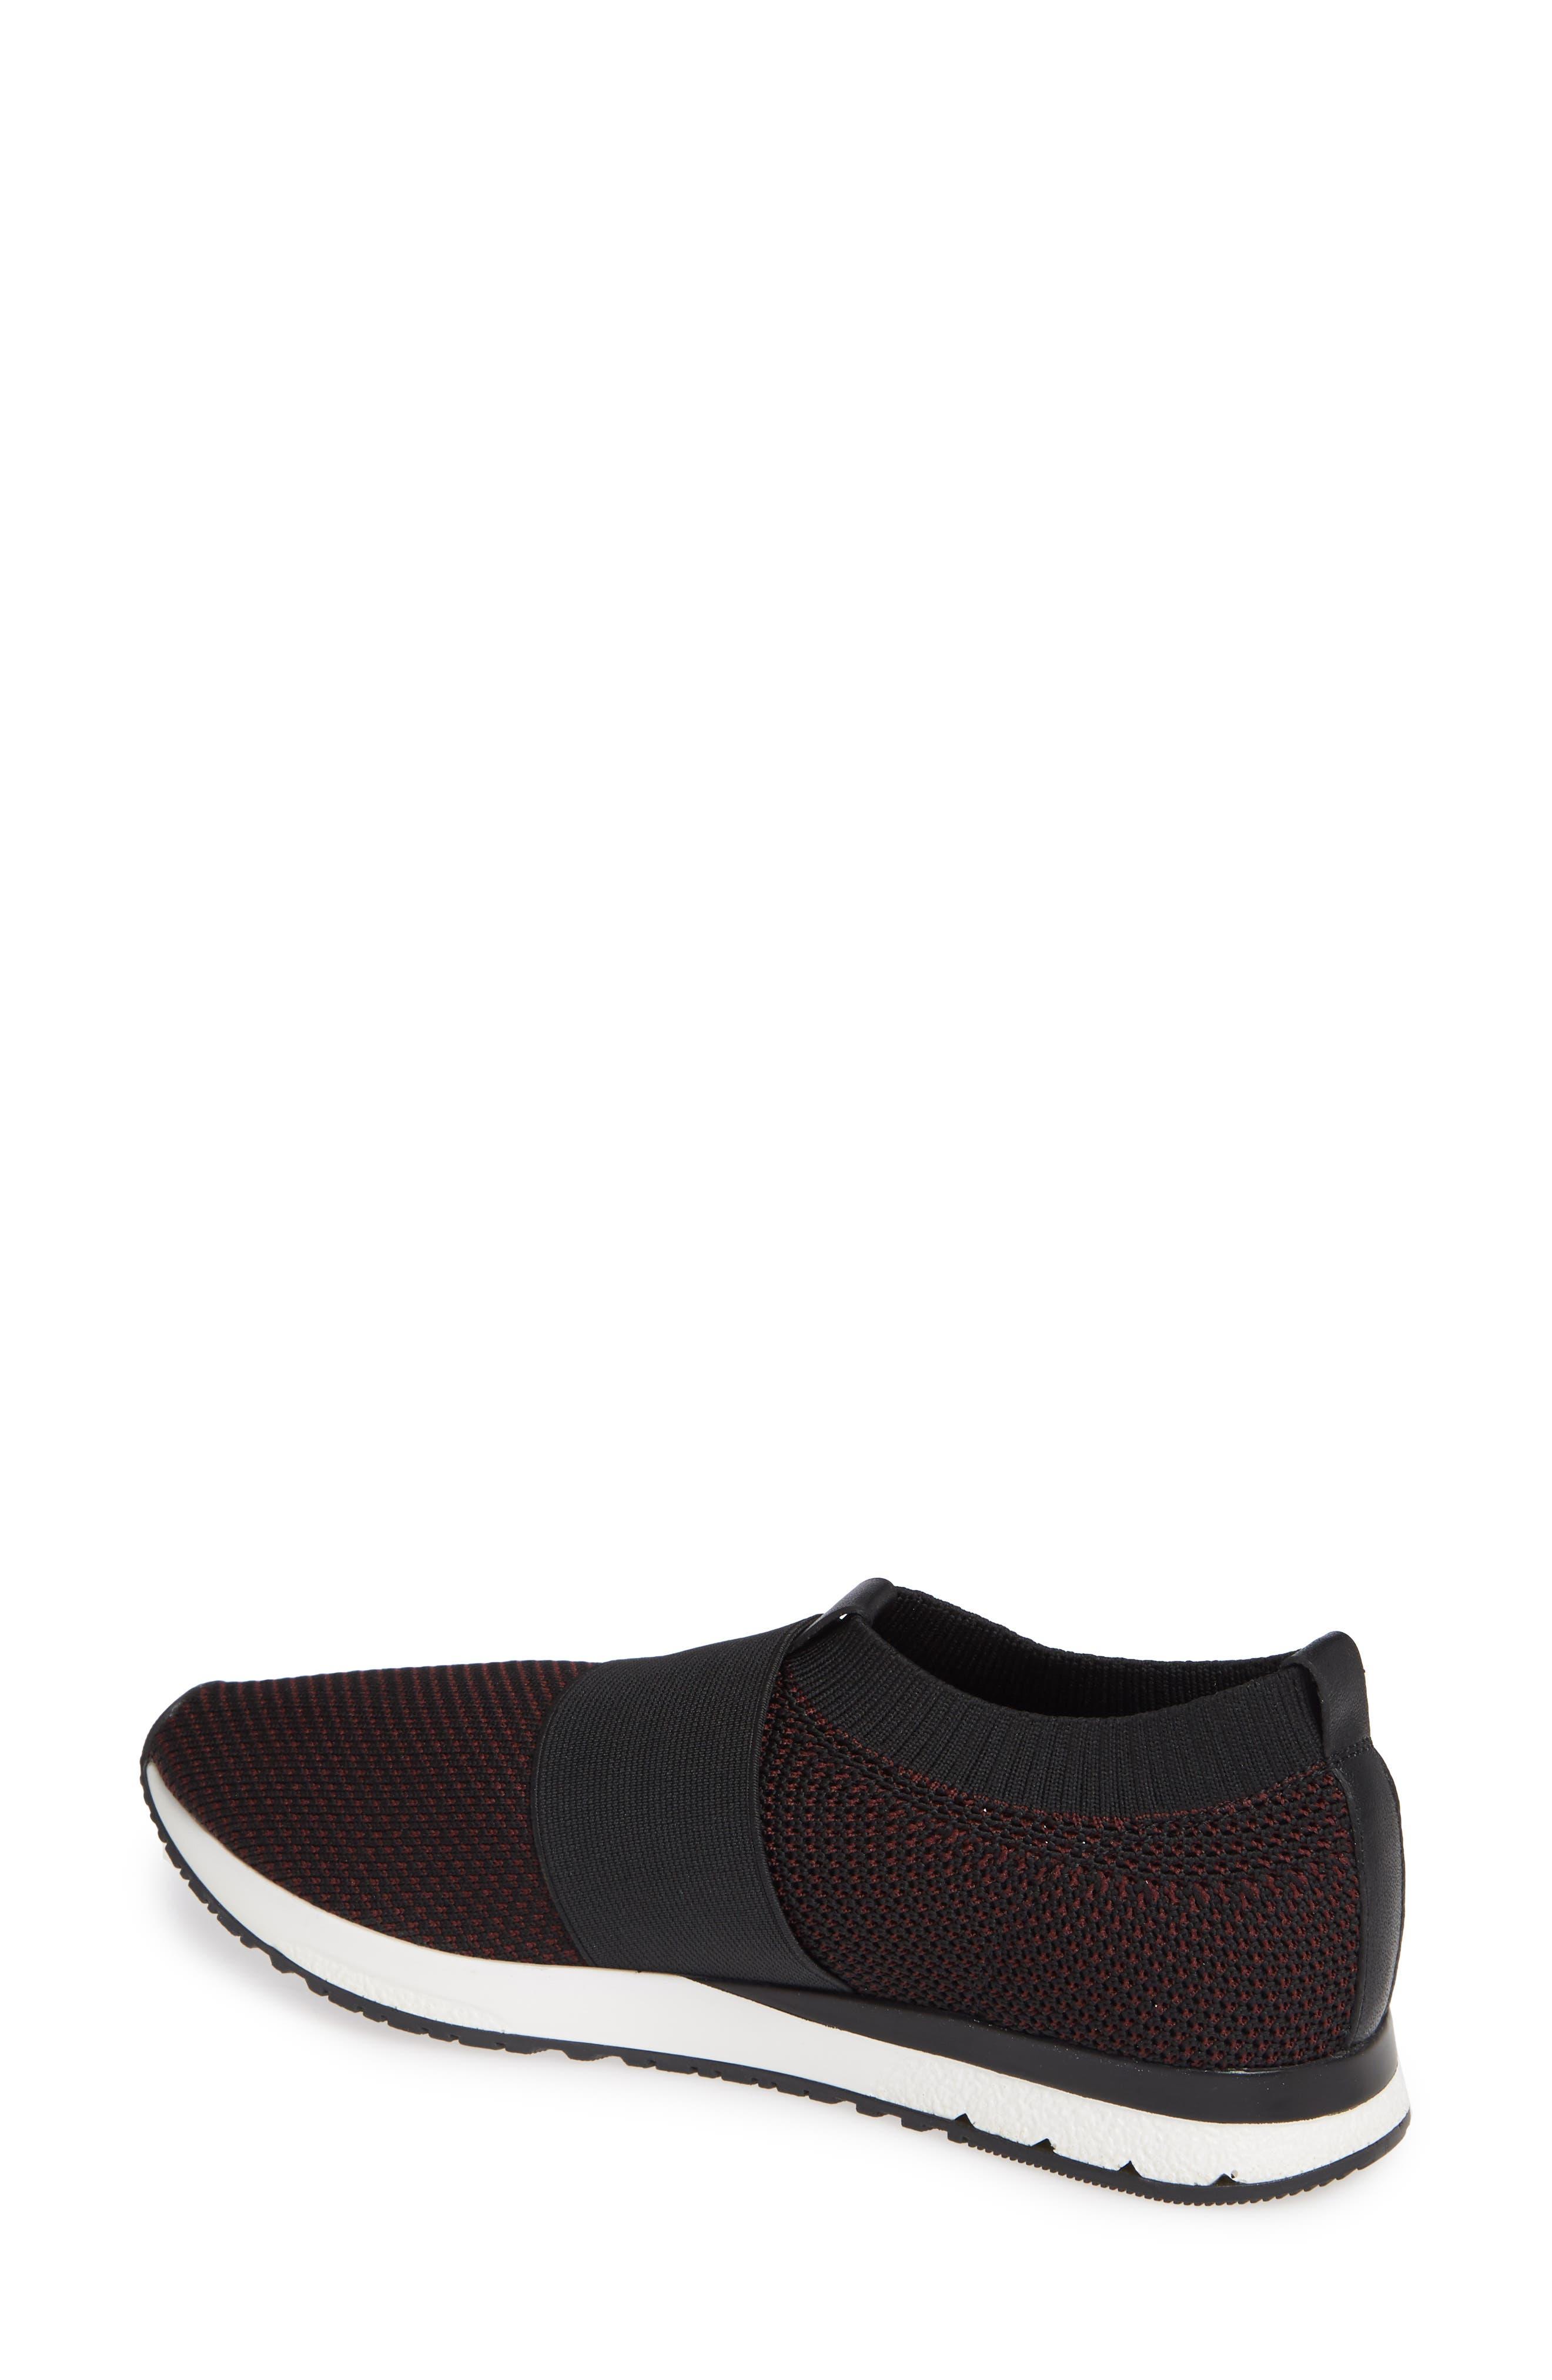 ,                             Brooke Slip-On Sneaker,                             Alternate thumbnail 2, color,                             BLACK/ WINE KNIT FABRIC